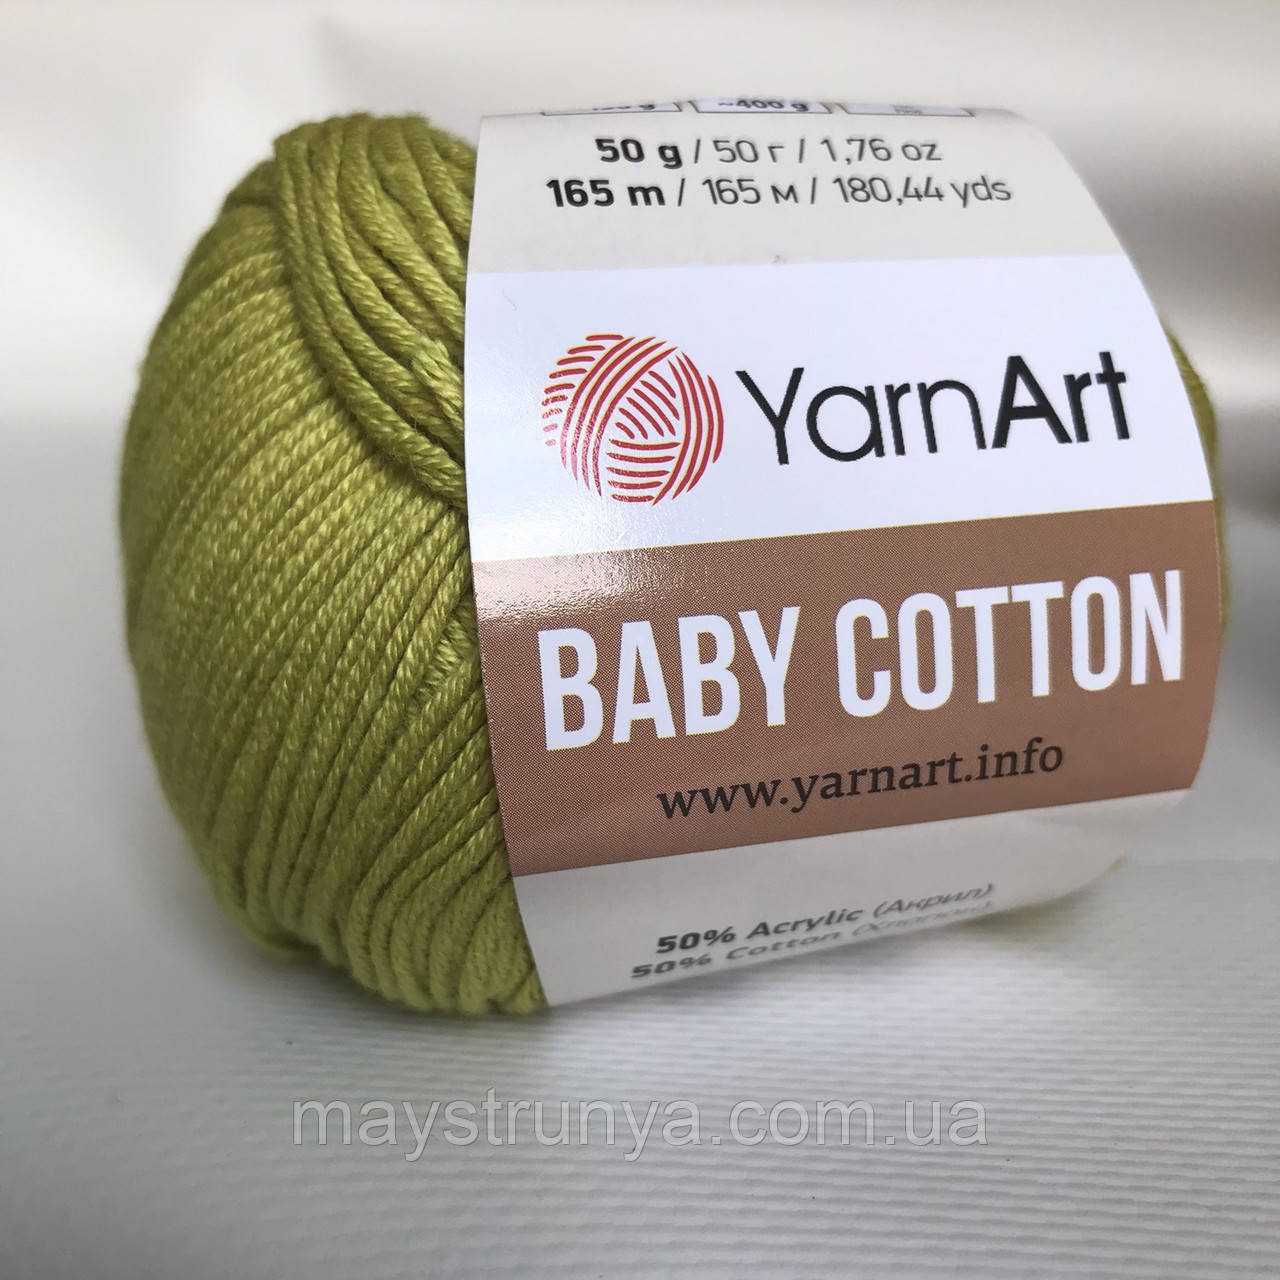 YarnArt Baby cotton 436 (полухлопок) Оливка